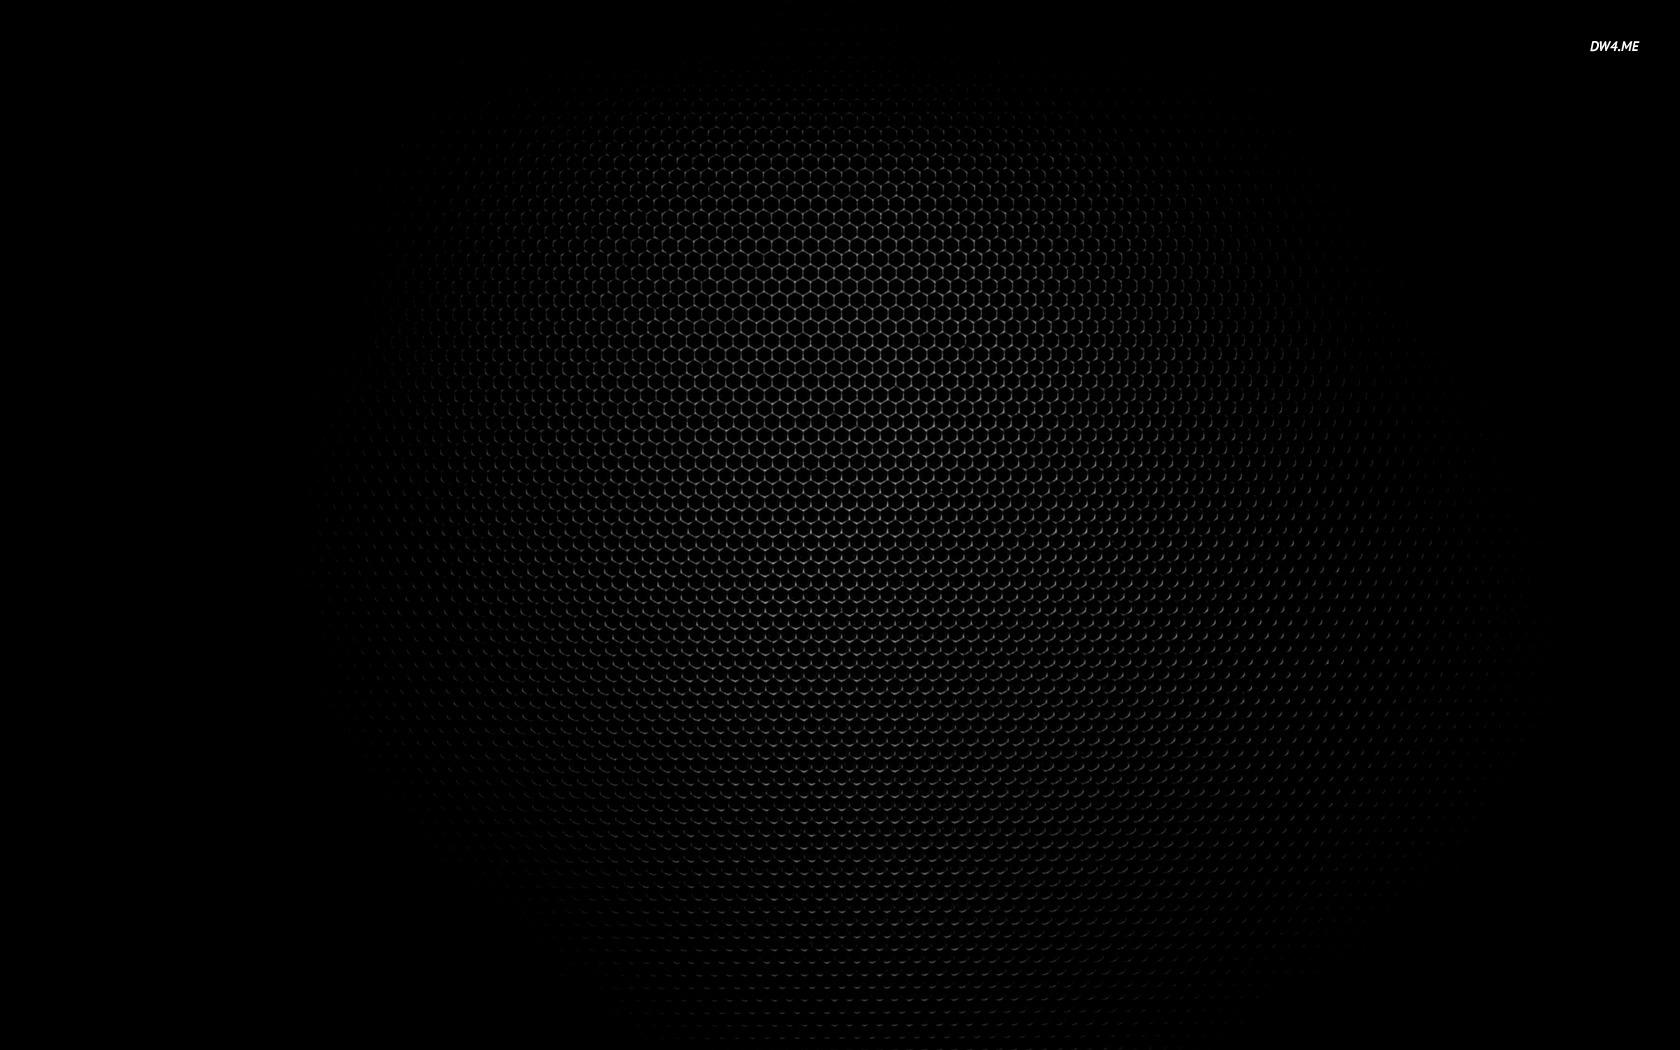 mesh wallpaper 1920x1080 Speaker mesh wallpaper 1920x1200 Speaker mesh 1680x1050